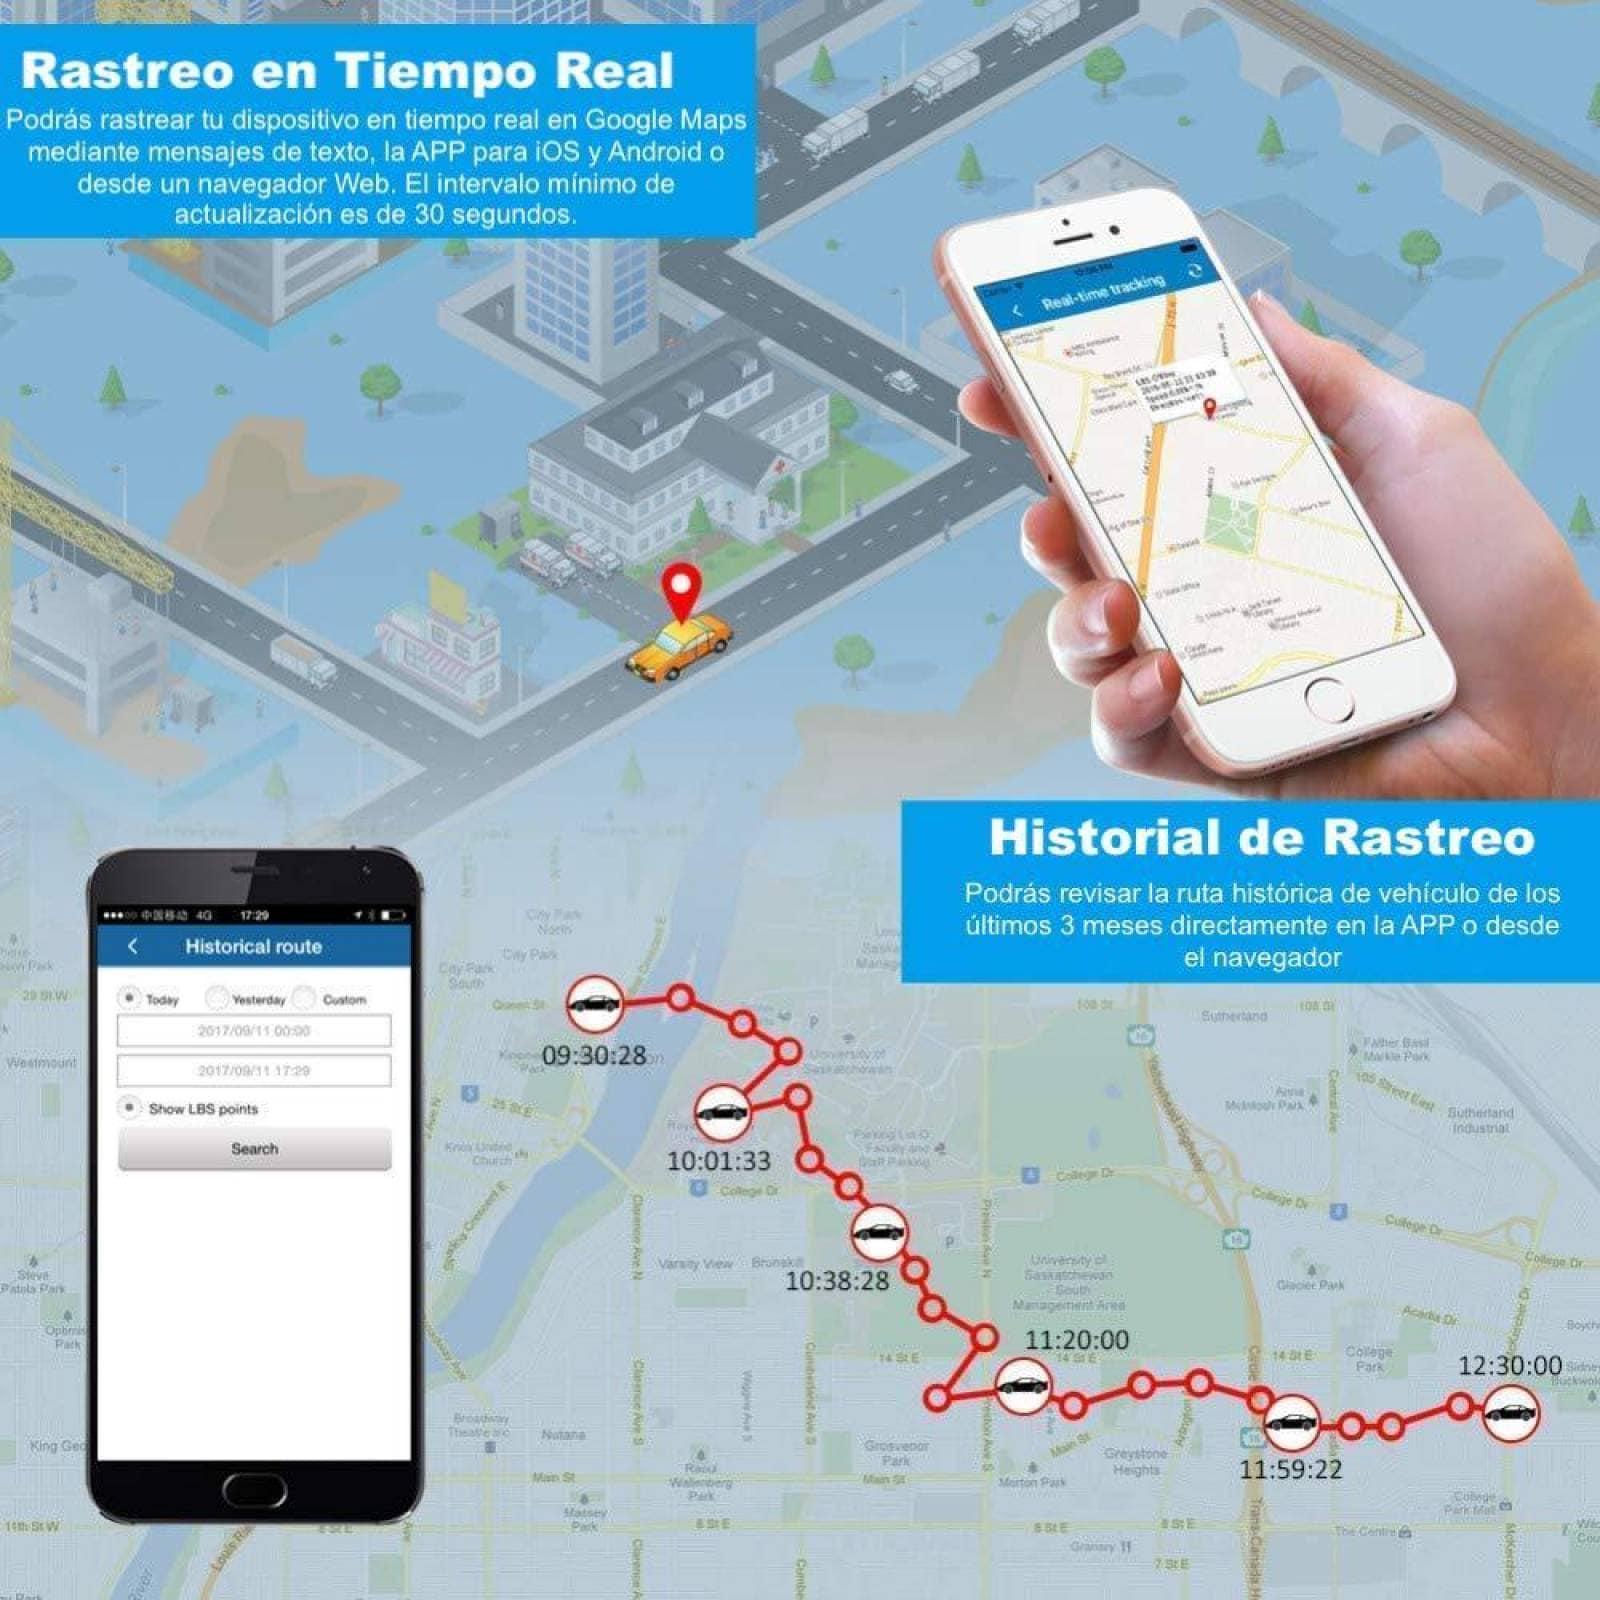 BINDEN Rastreador GPS TK913 con Imán y Micrófono Ideal para Vehículo Moto o Personas Batería por hasta 25 Días